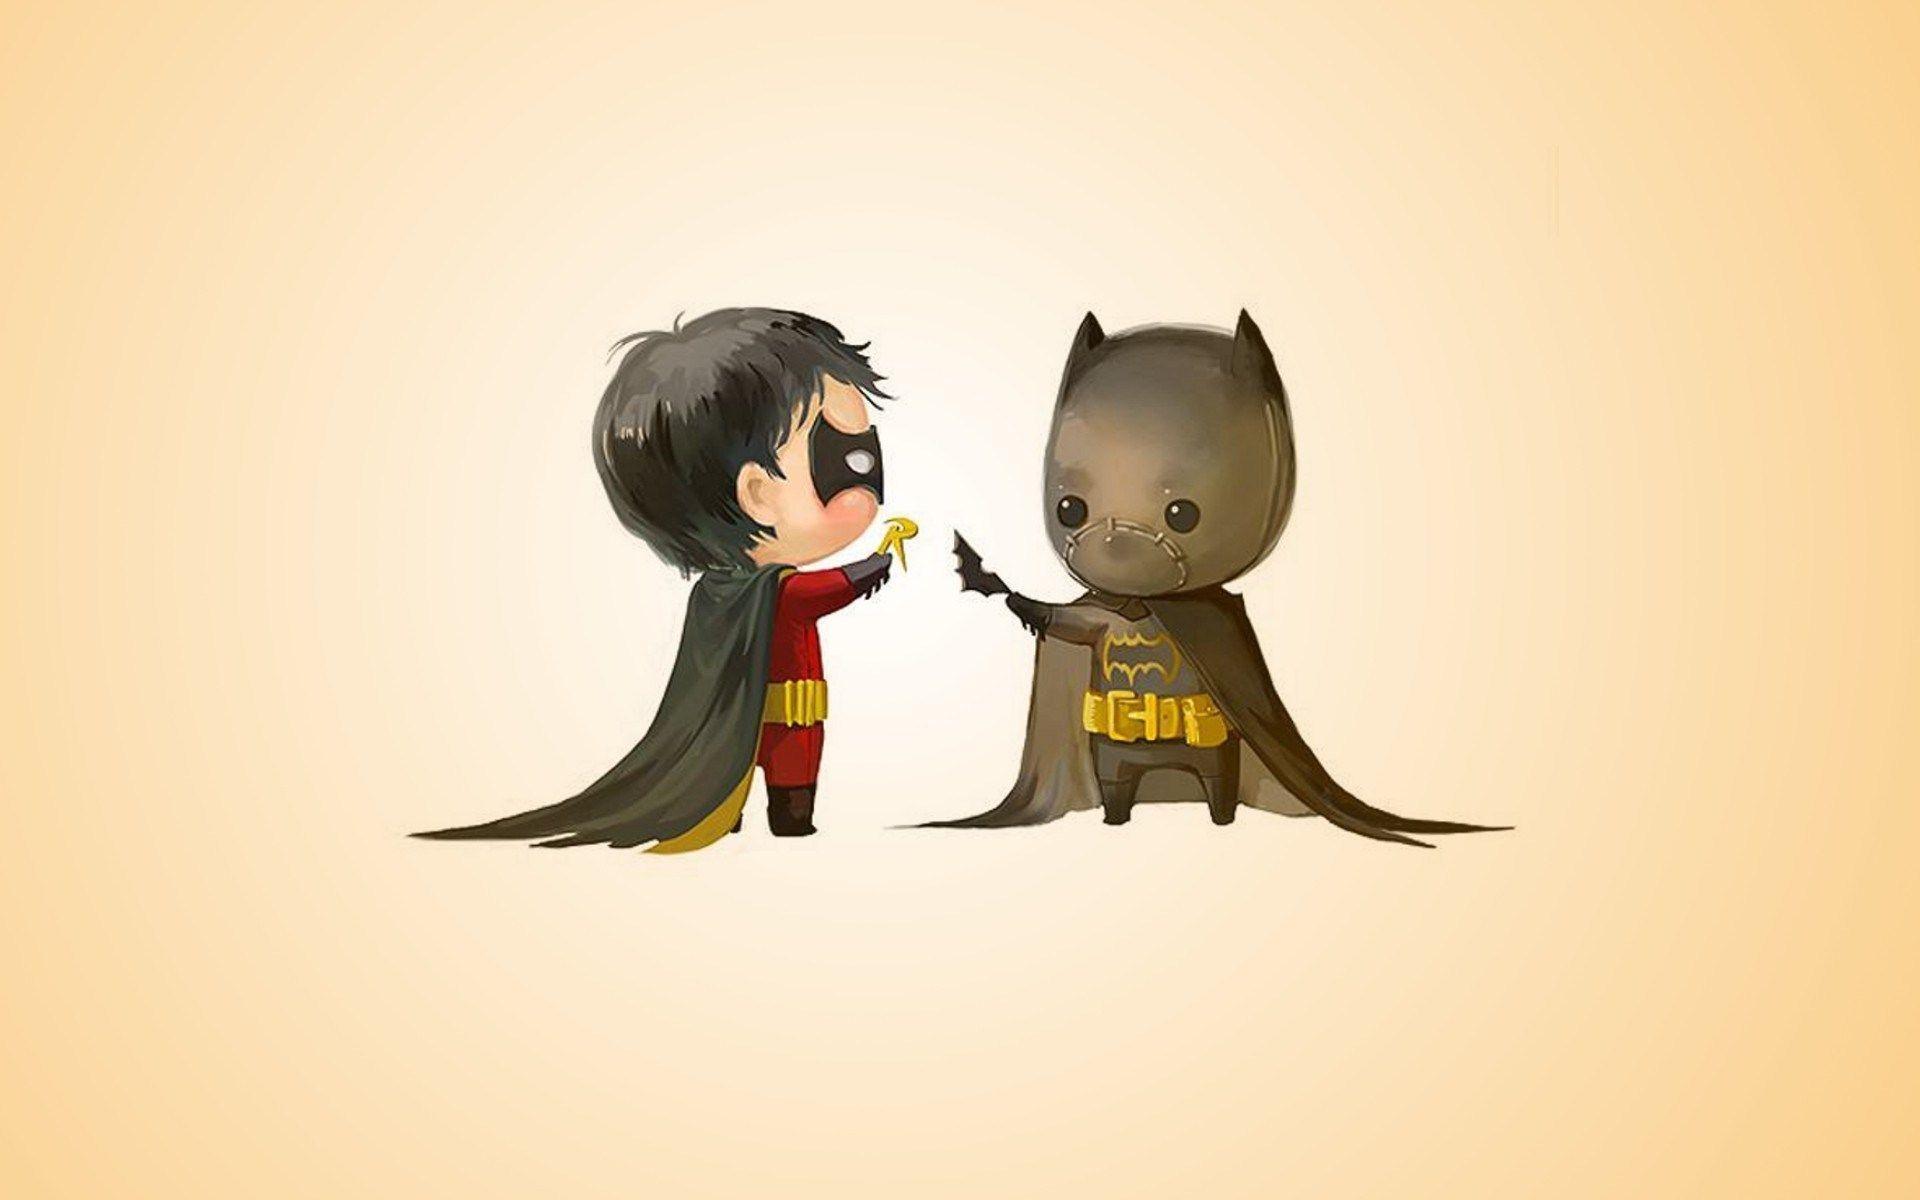 Batman and Robin Wallpaper HD - WallpaperSafari